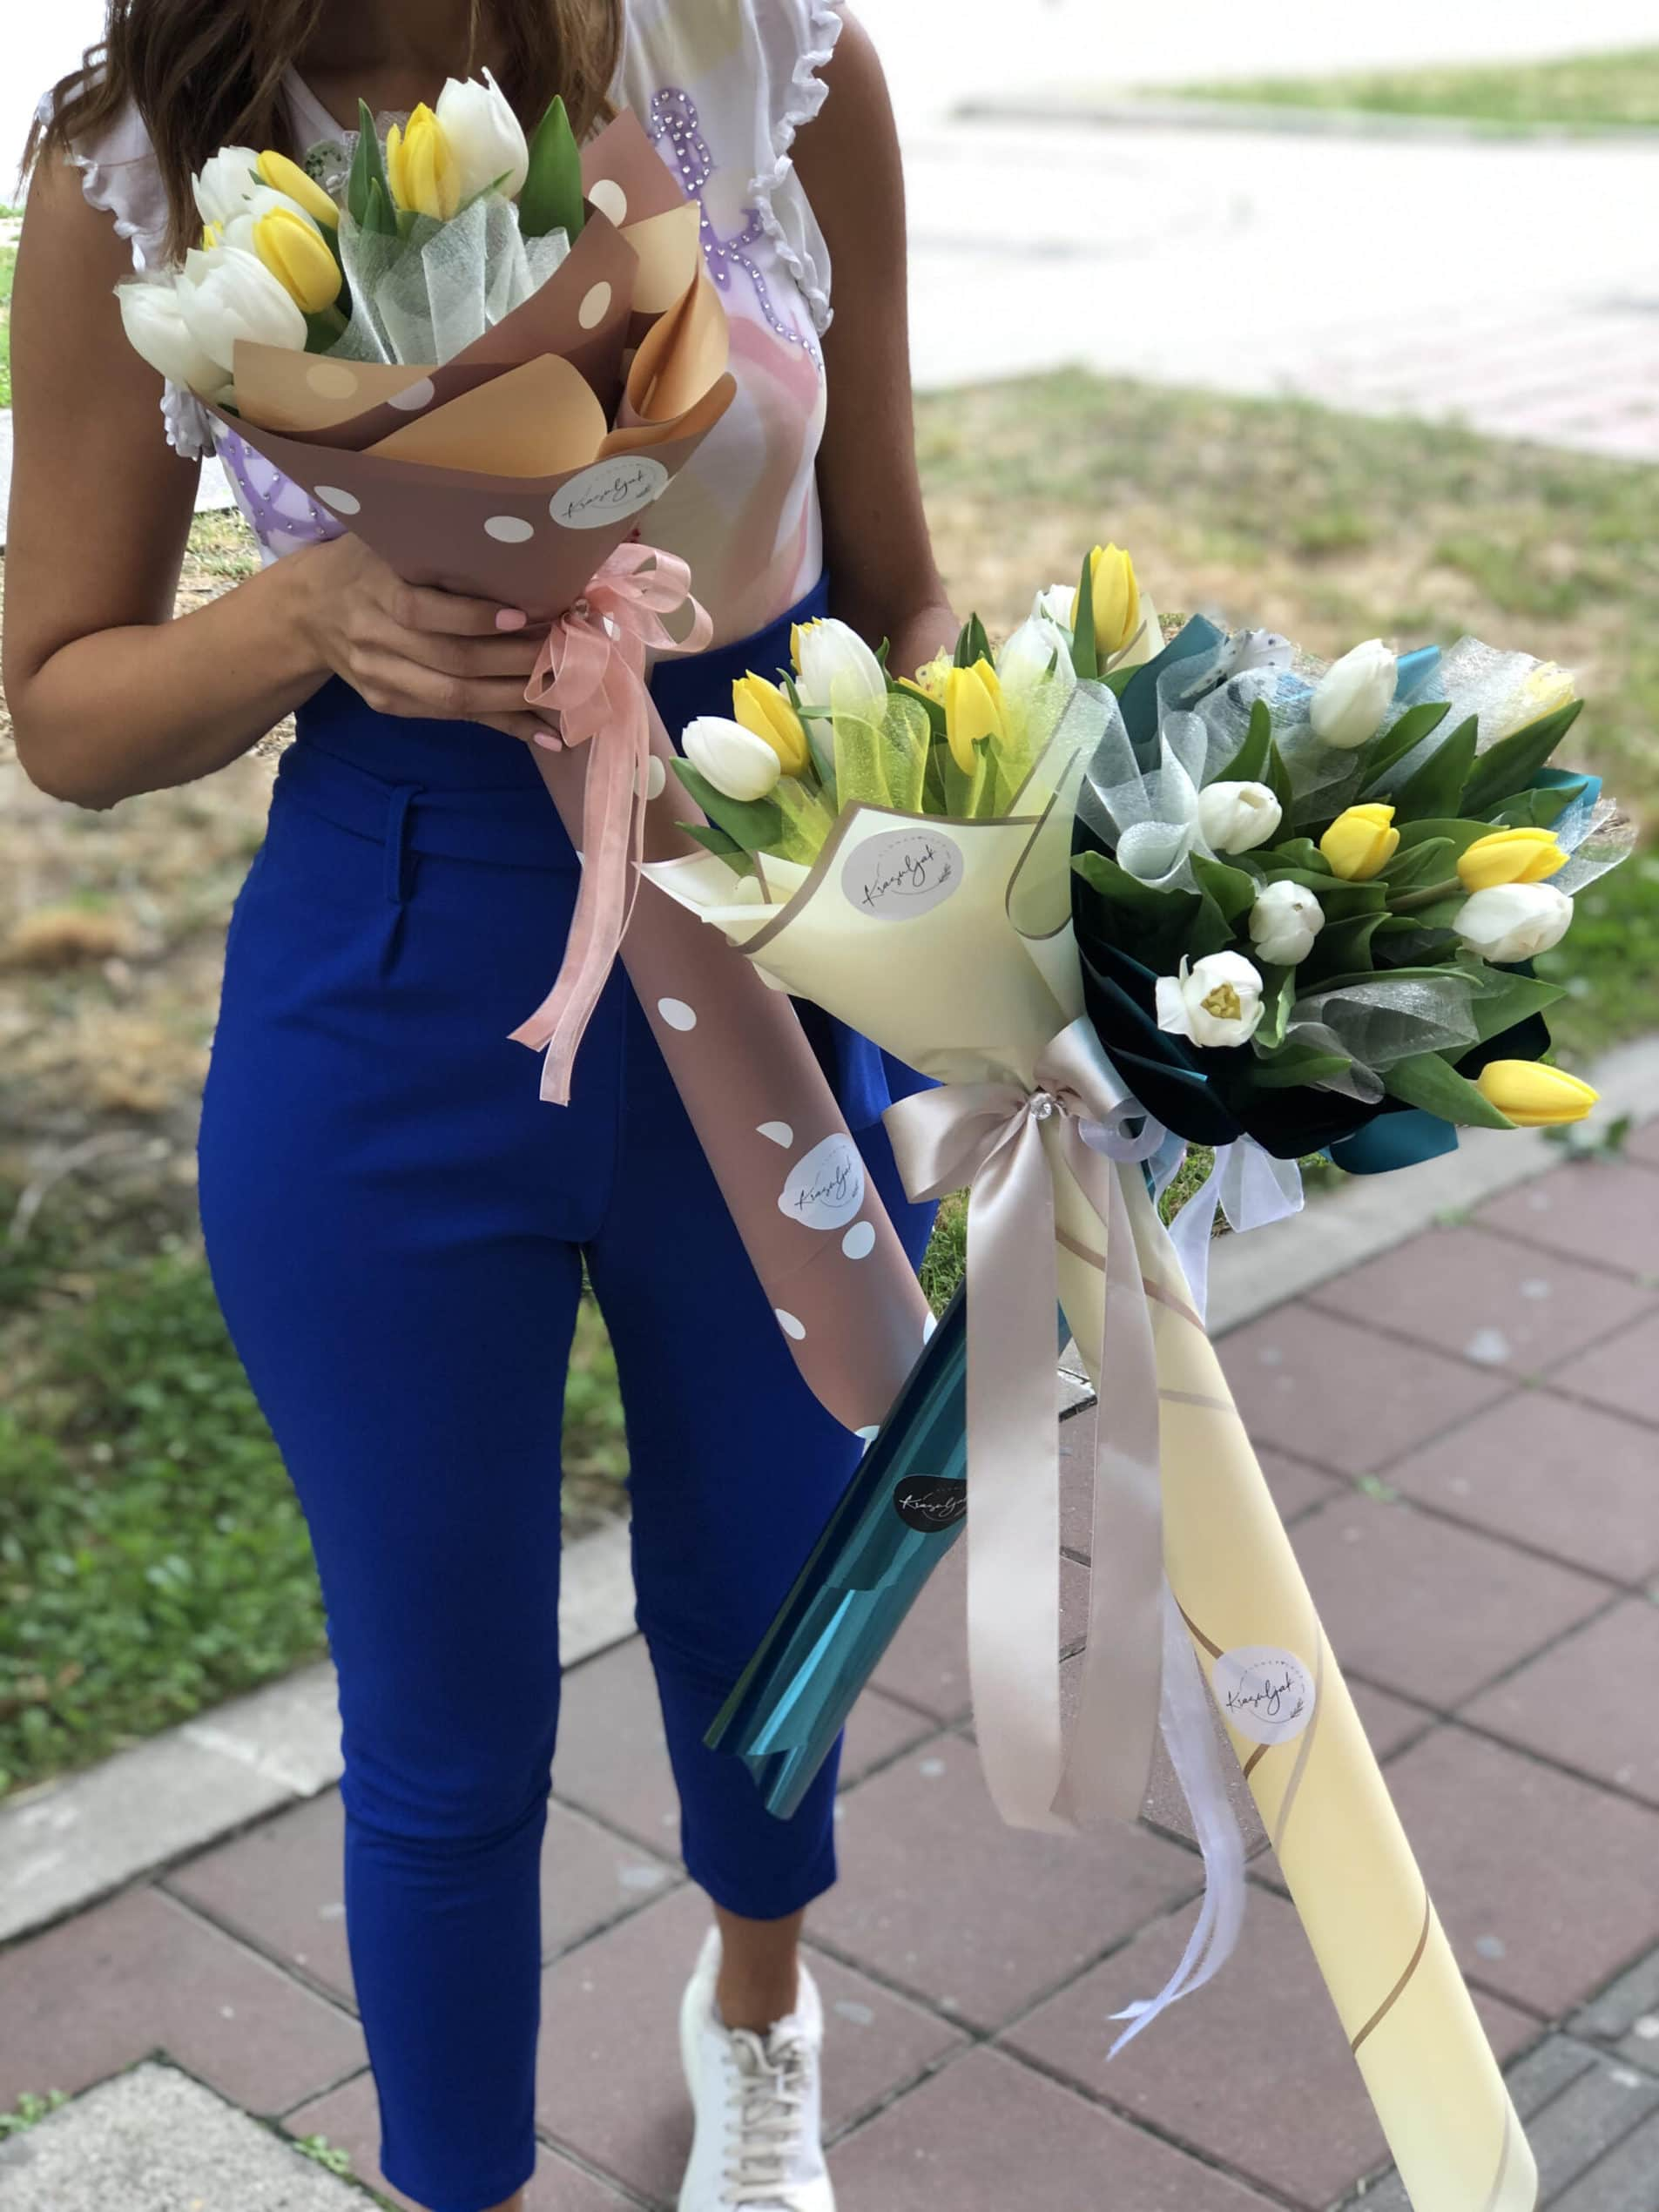 Cveće - cvećara, lale, buket lala